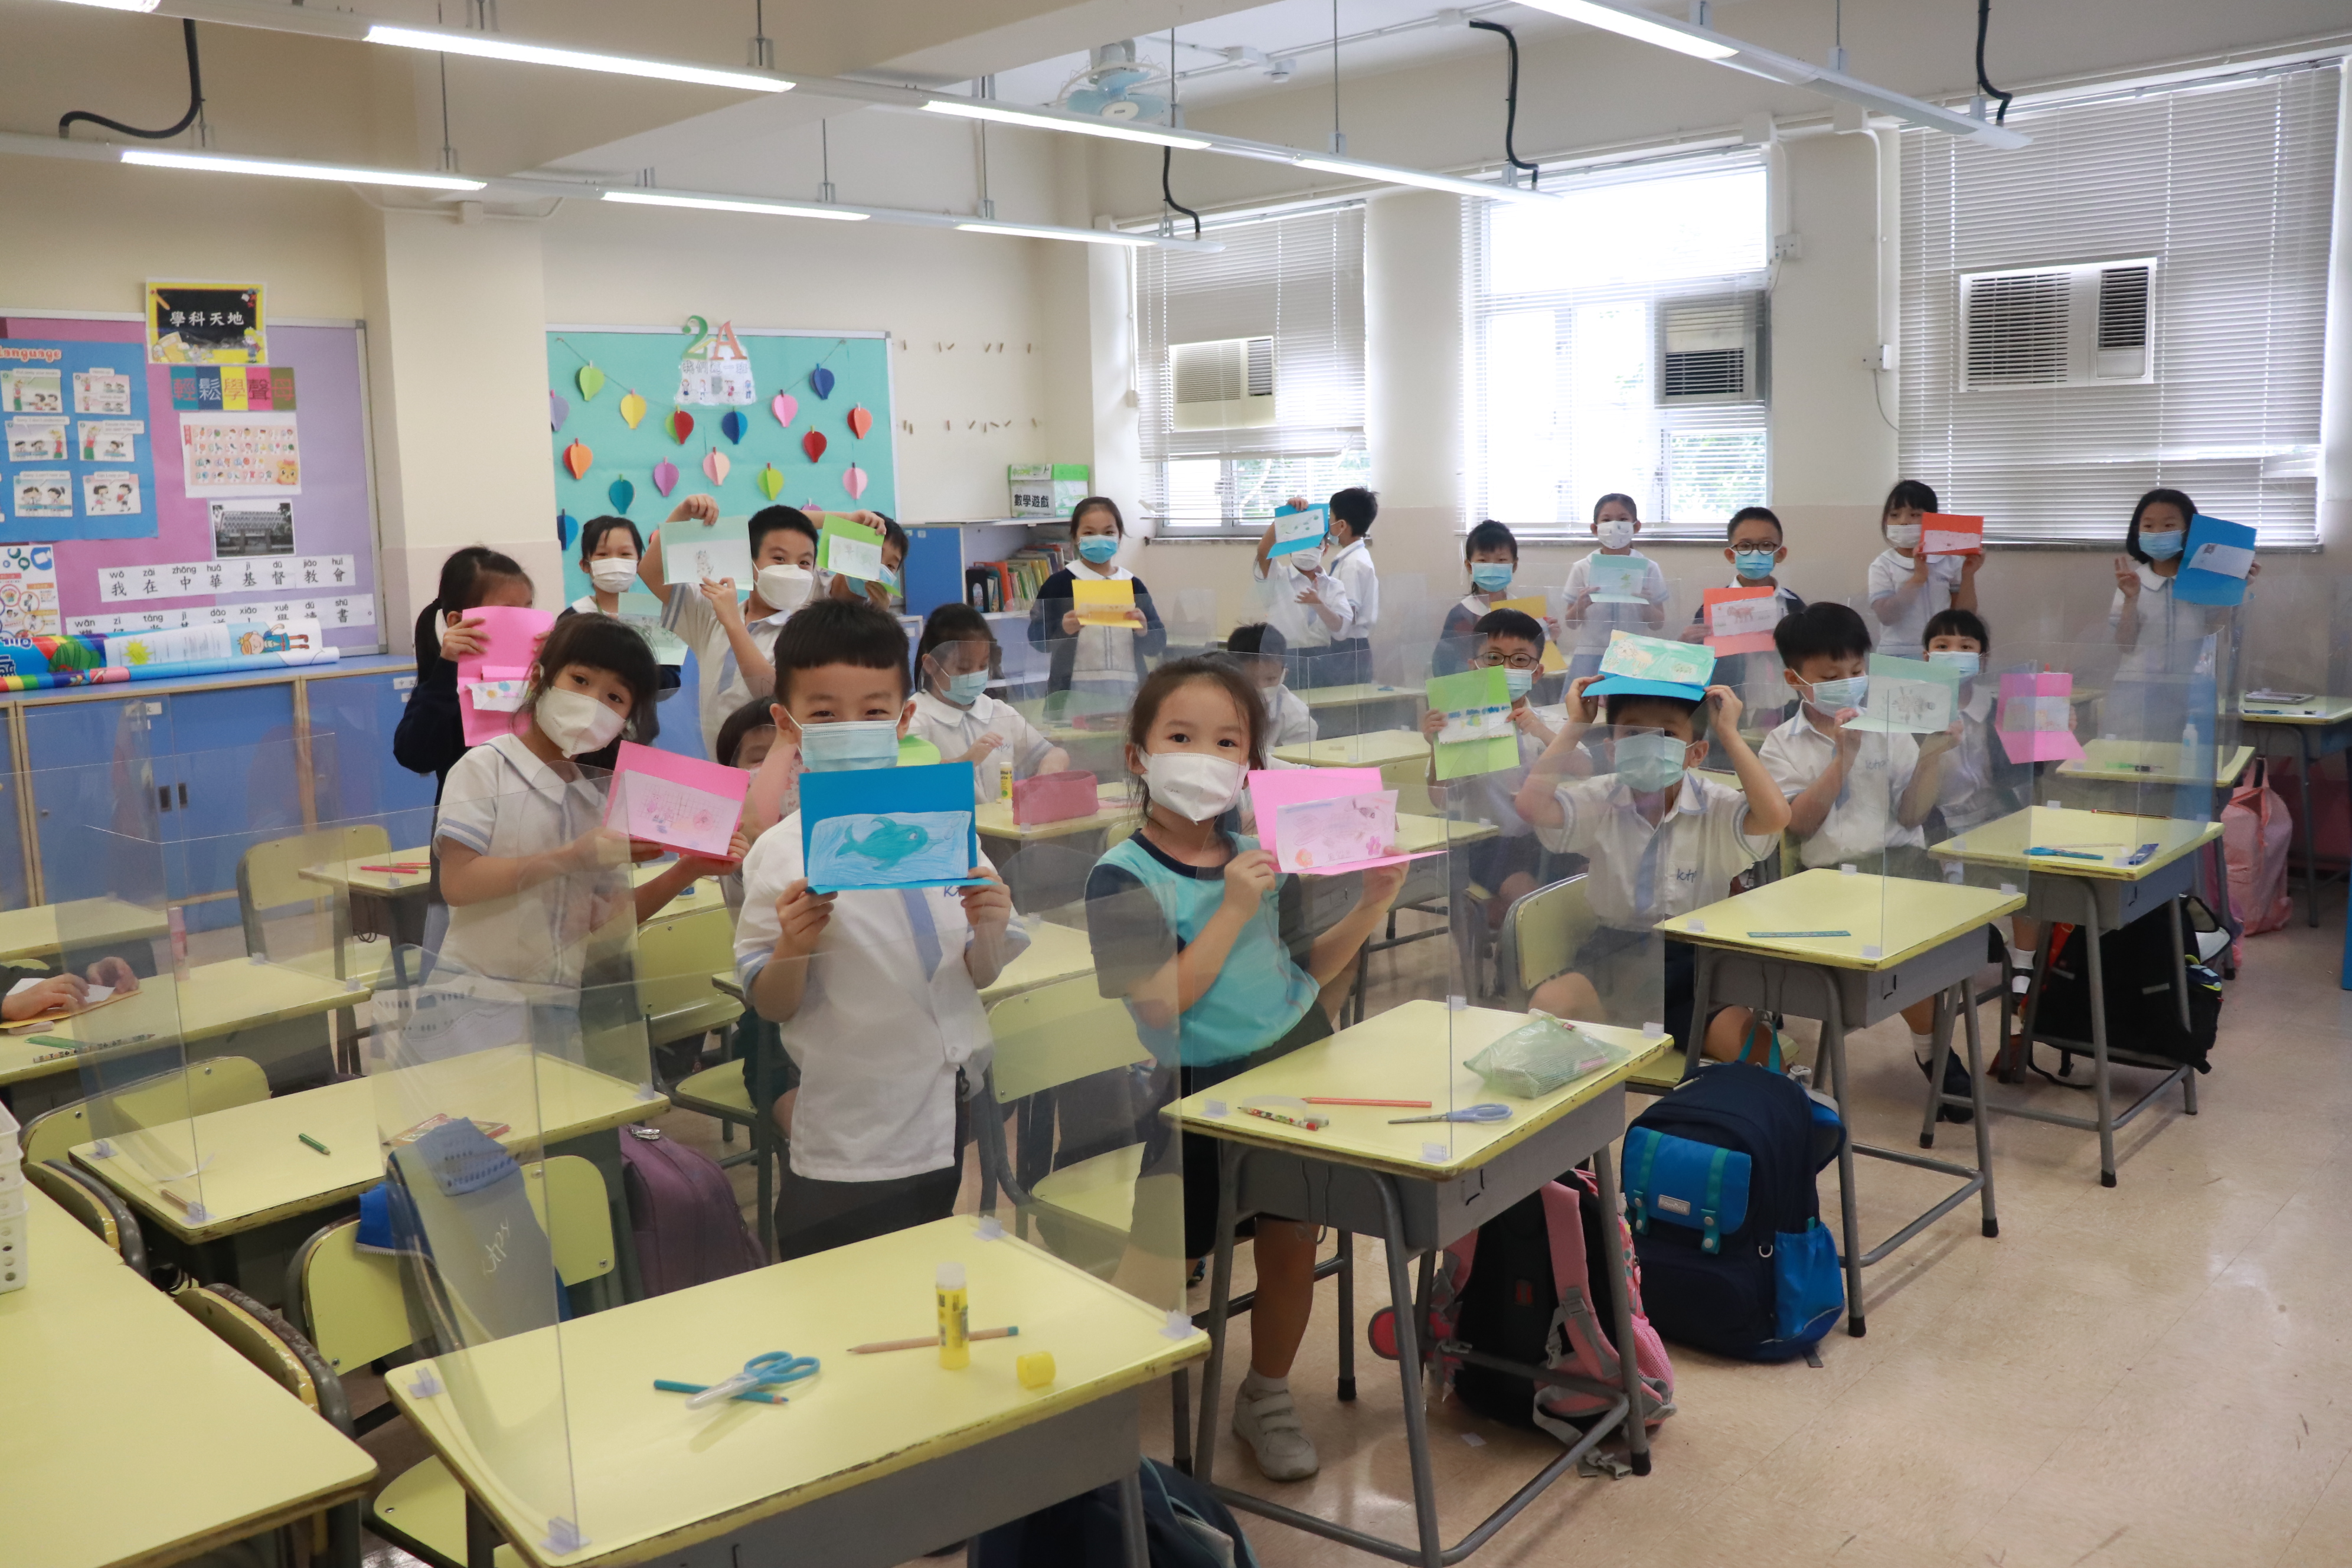 http://keito.school.hk/sites/default/files/img_6707.jpg